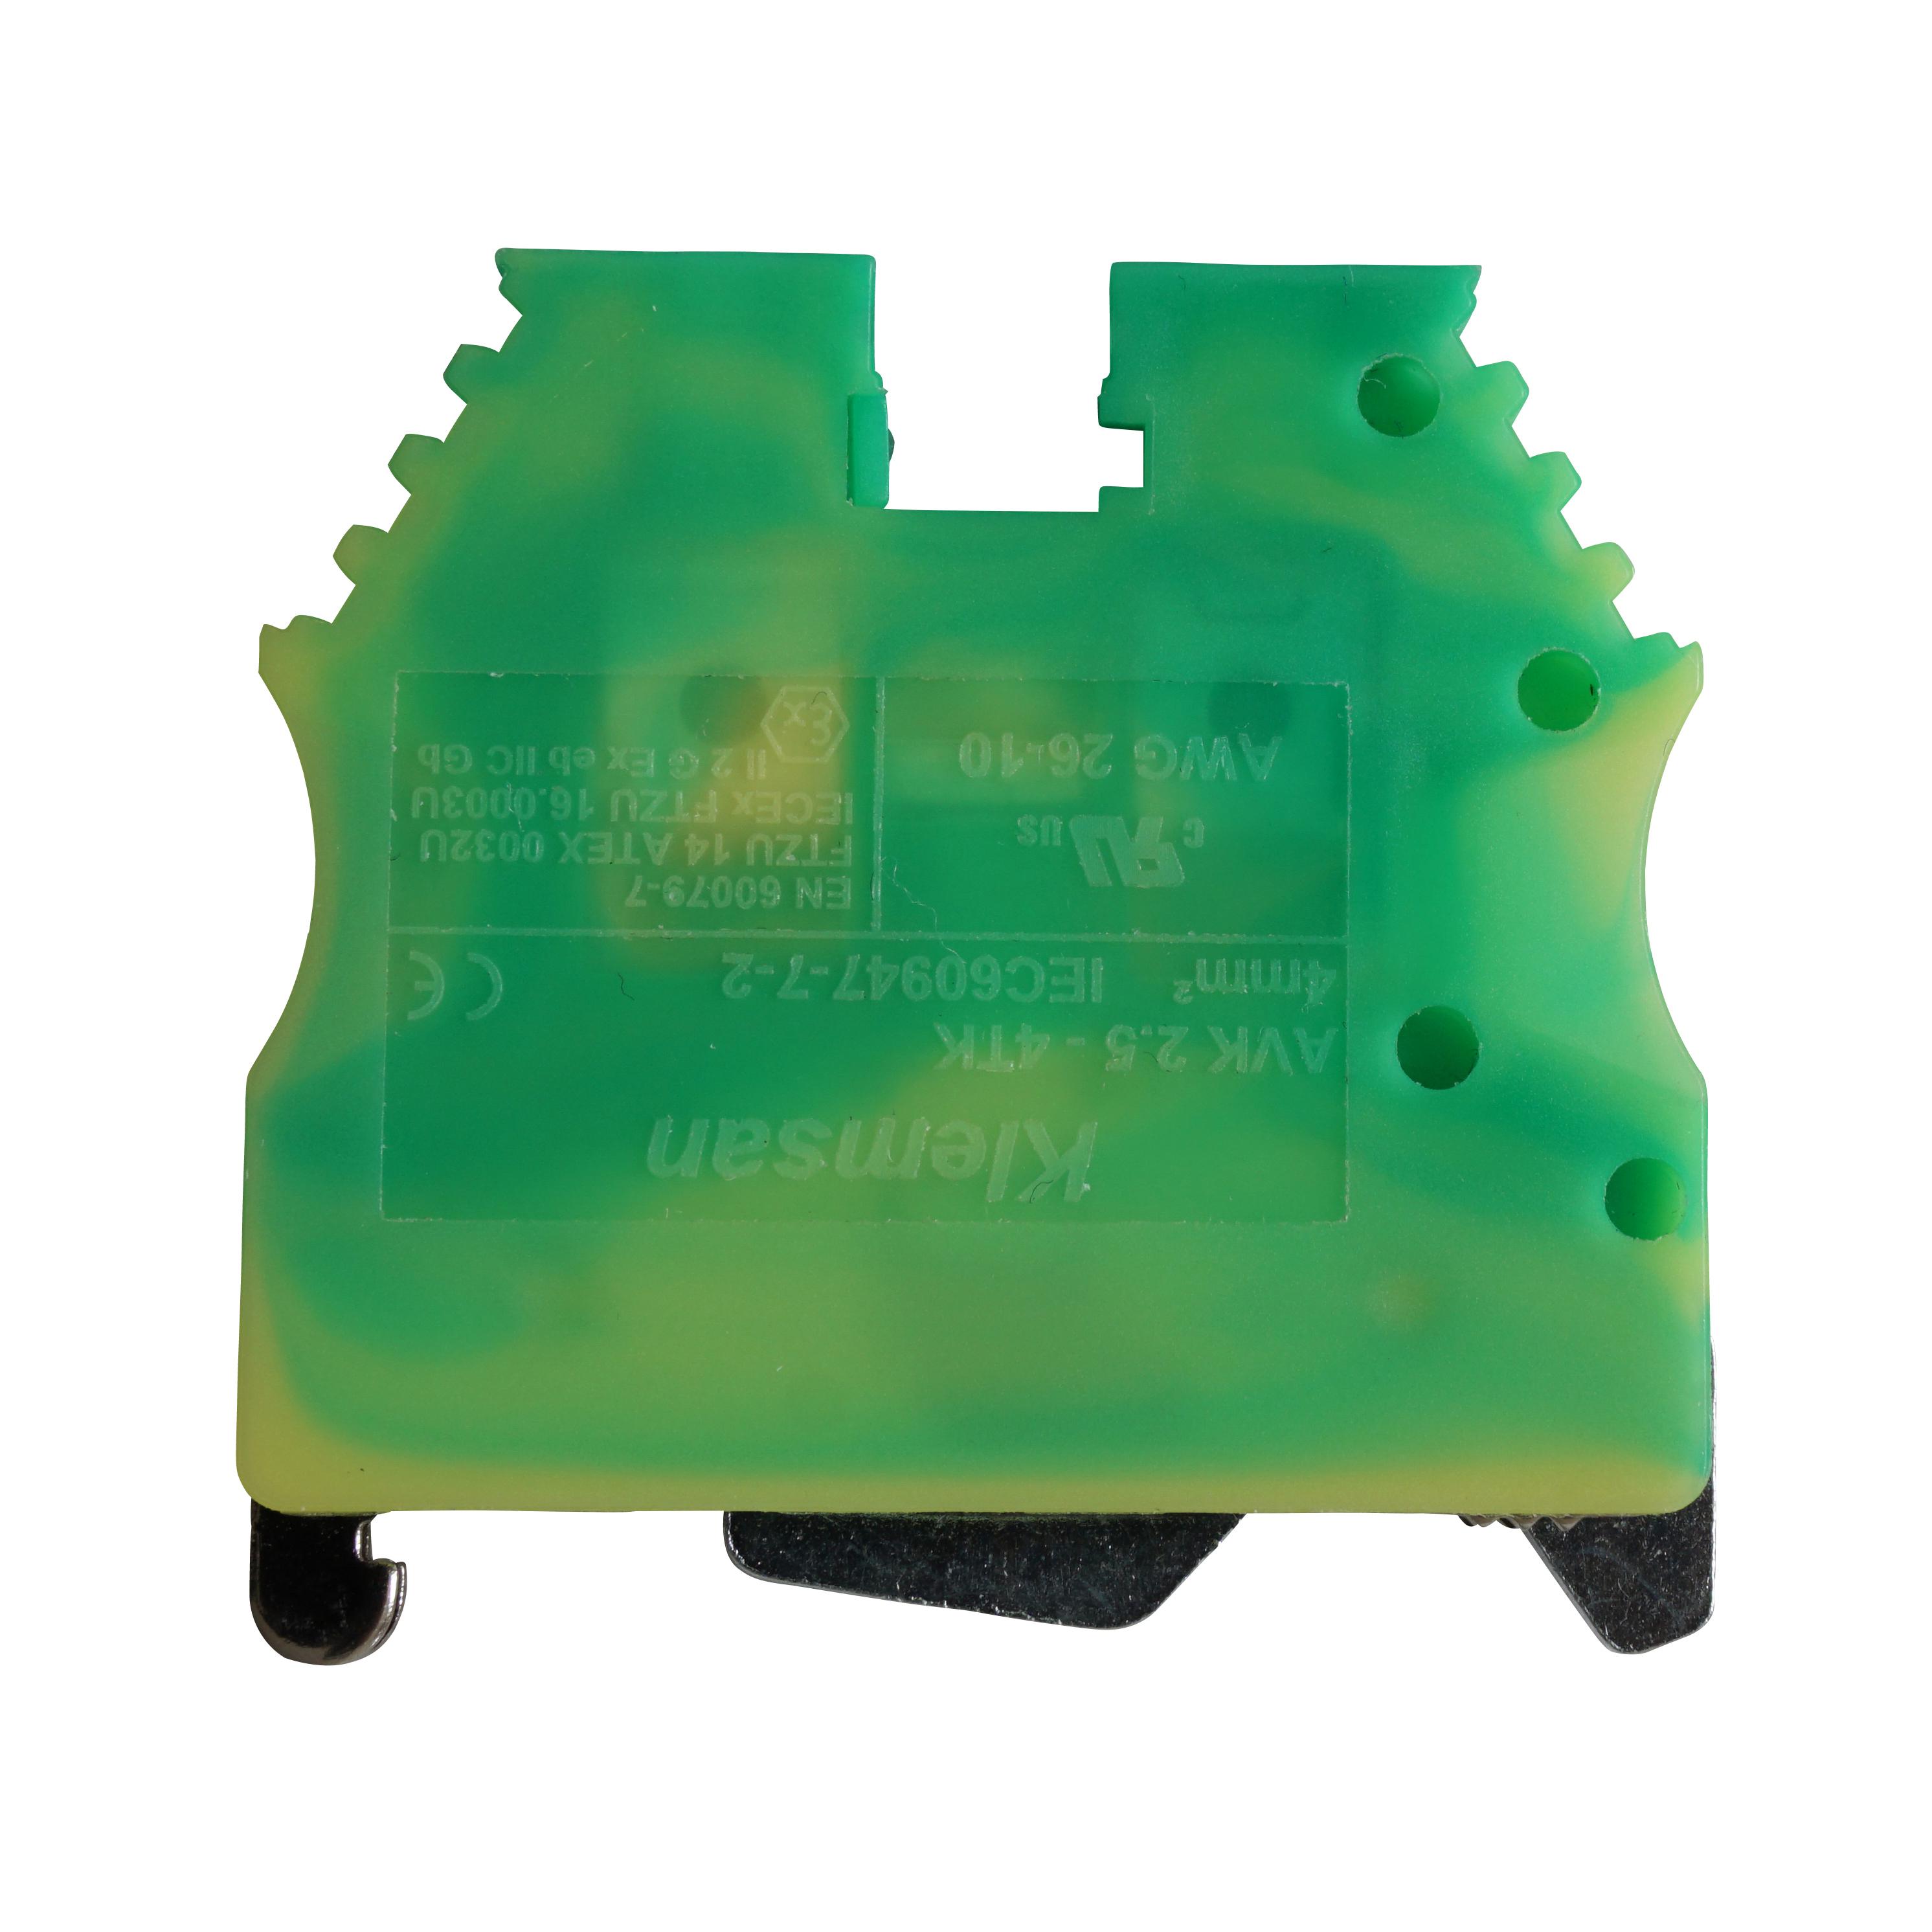 1 Stk Schutzleiterklemme 2,5-4mm², Type AVK 2,5/4 T IK622002--